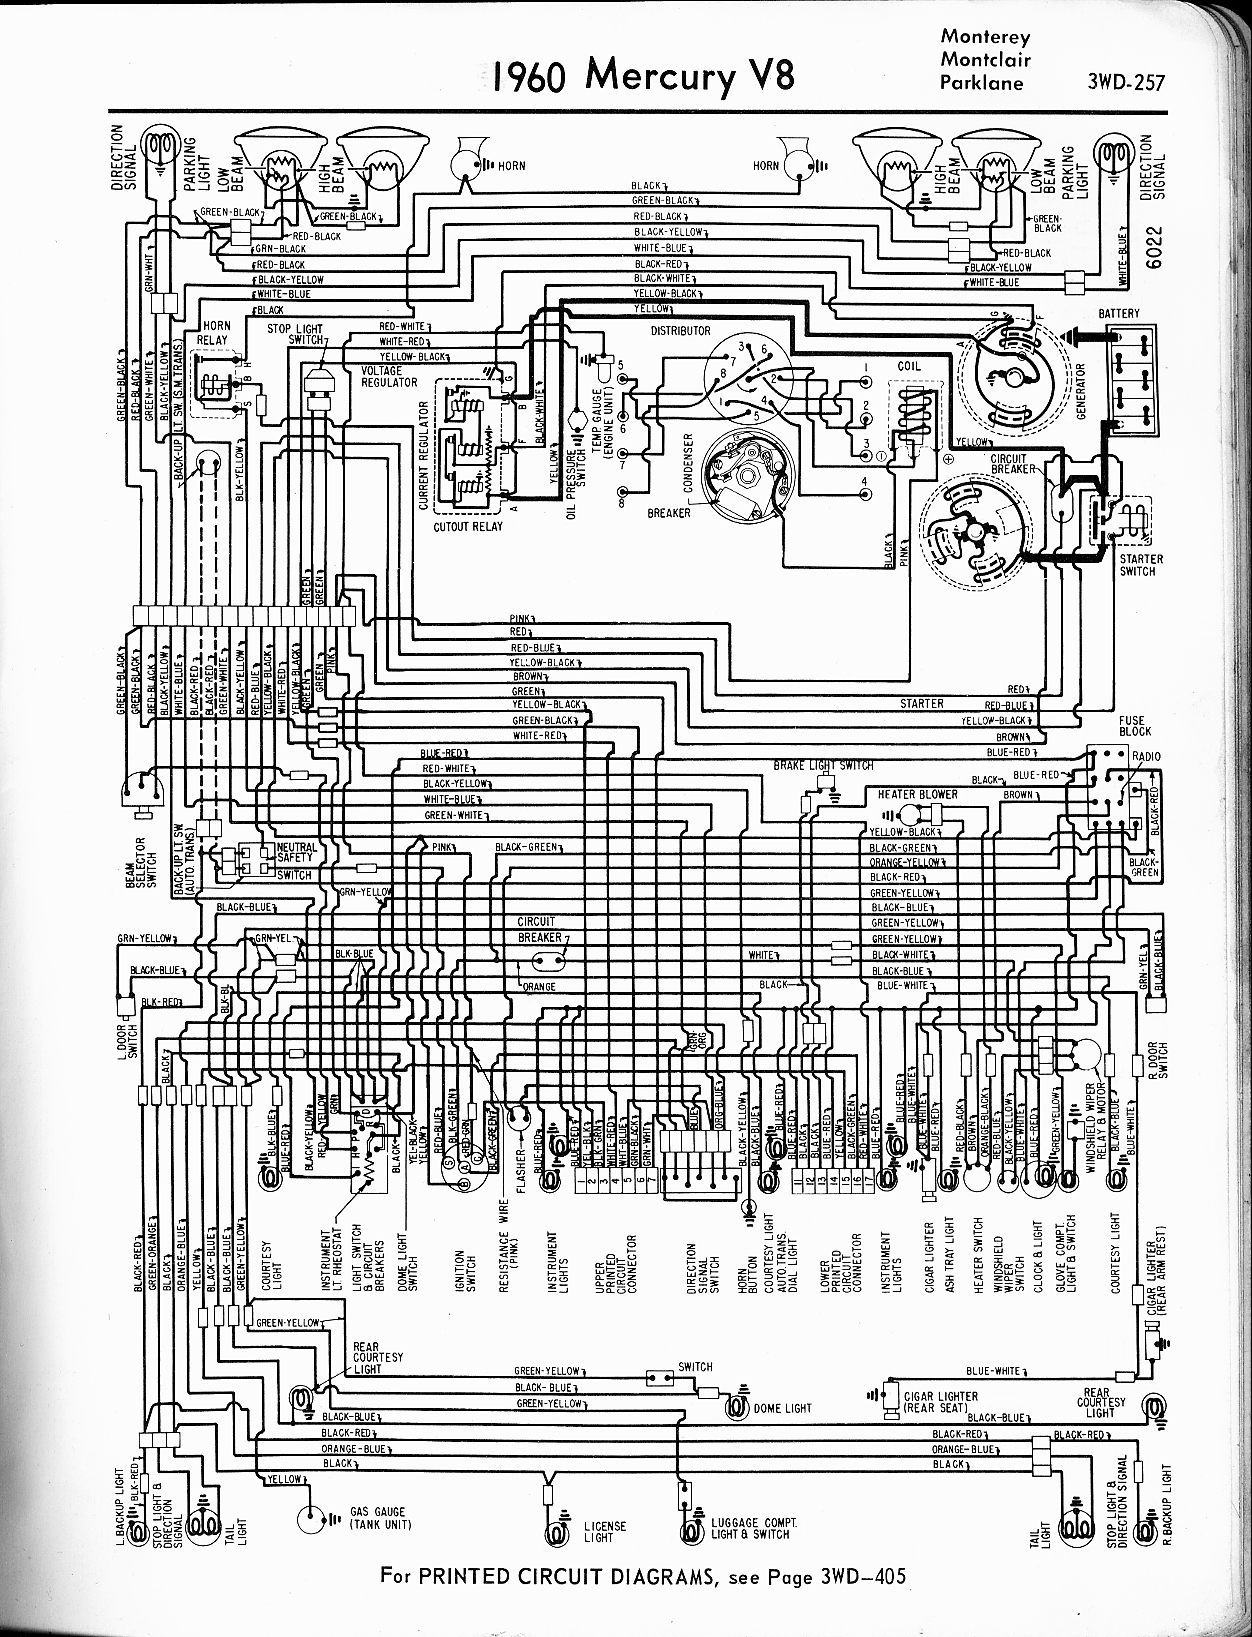 1969 Mercury Cyclone Wiring Diagram 2013 Gy6 50cc Wiring Diagram Jaguars 1997wir Jeanjaures37 Fr